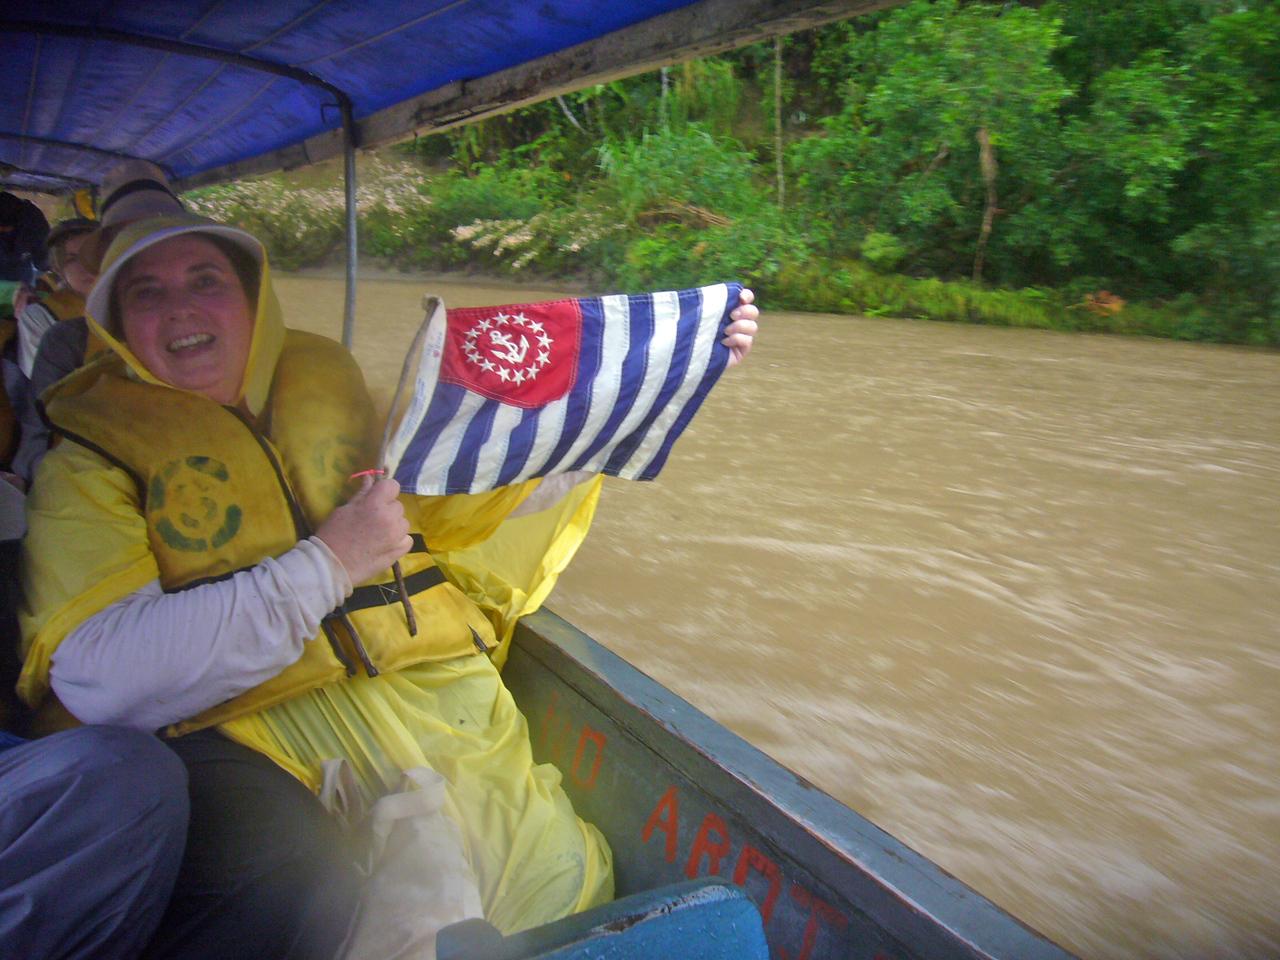 P/DLt Marilynn Bezdek AP proudly displays the USPS Ensign during a rainstorm on the Napo River, Ecuador - William Bezdek